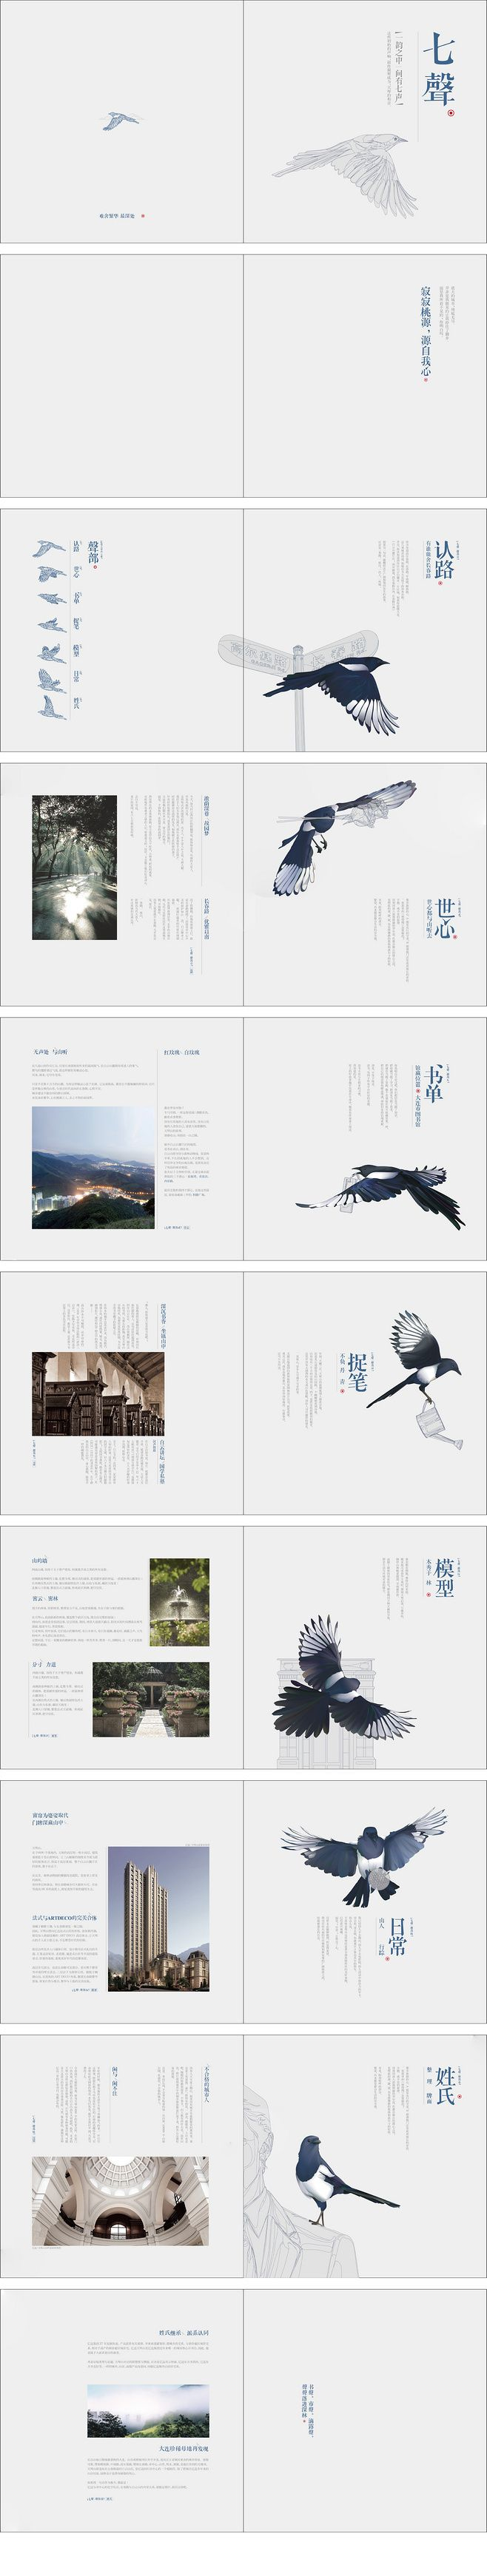 VI画册设计 【水云居】 一 书装/画册...